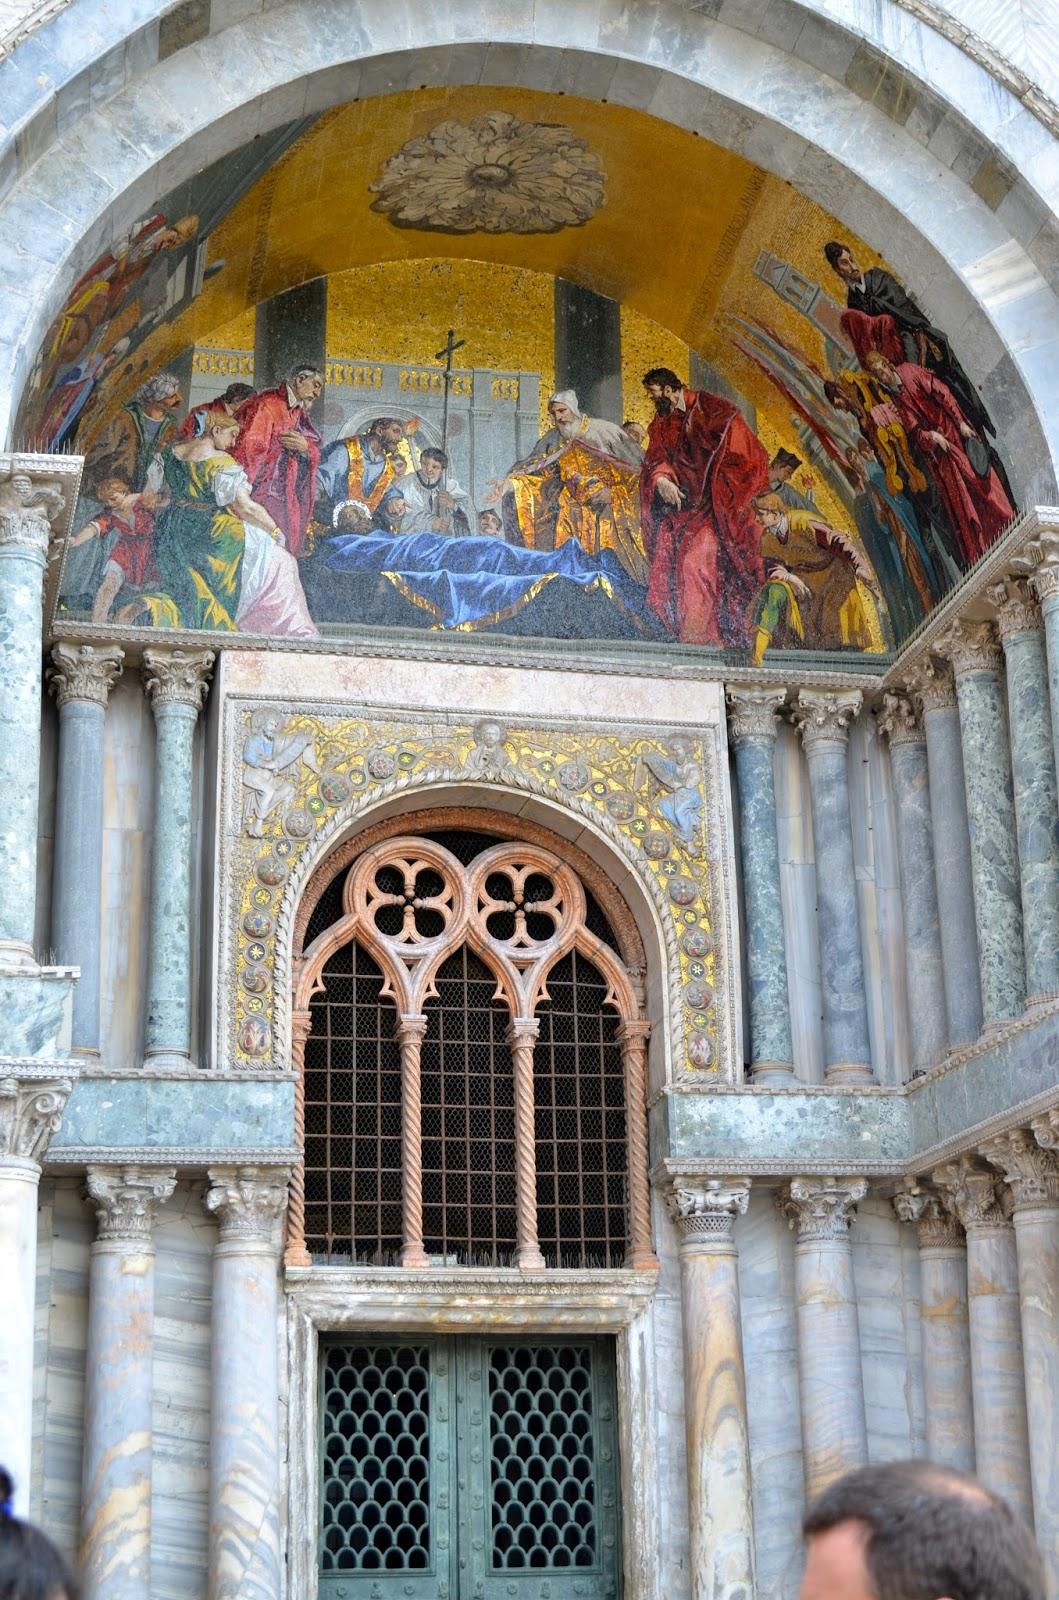 St. Mark's Basilica, Venice